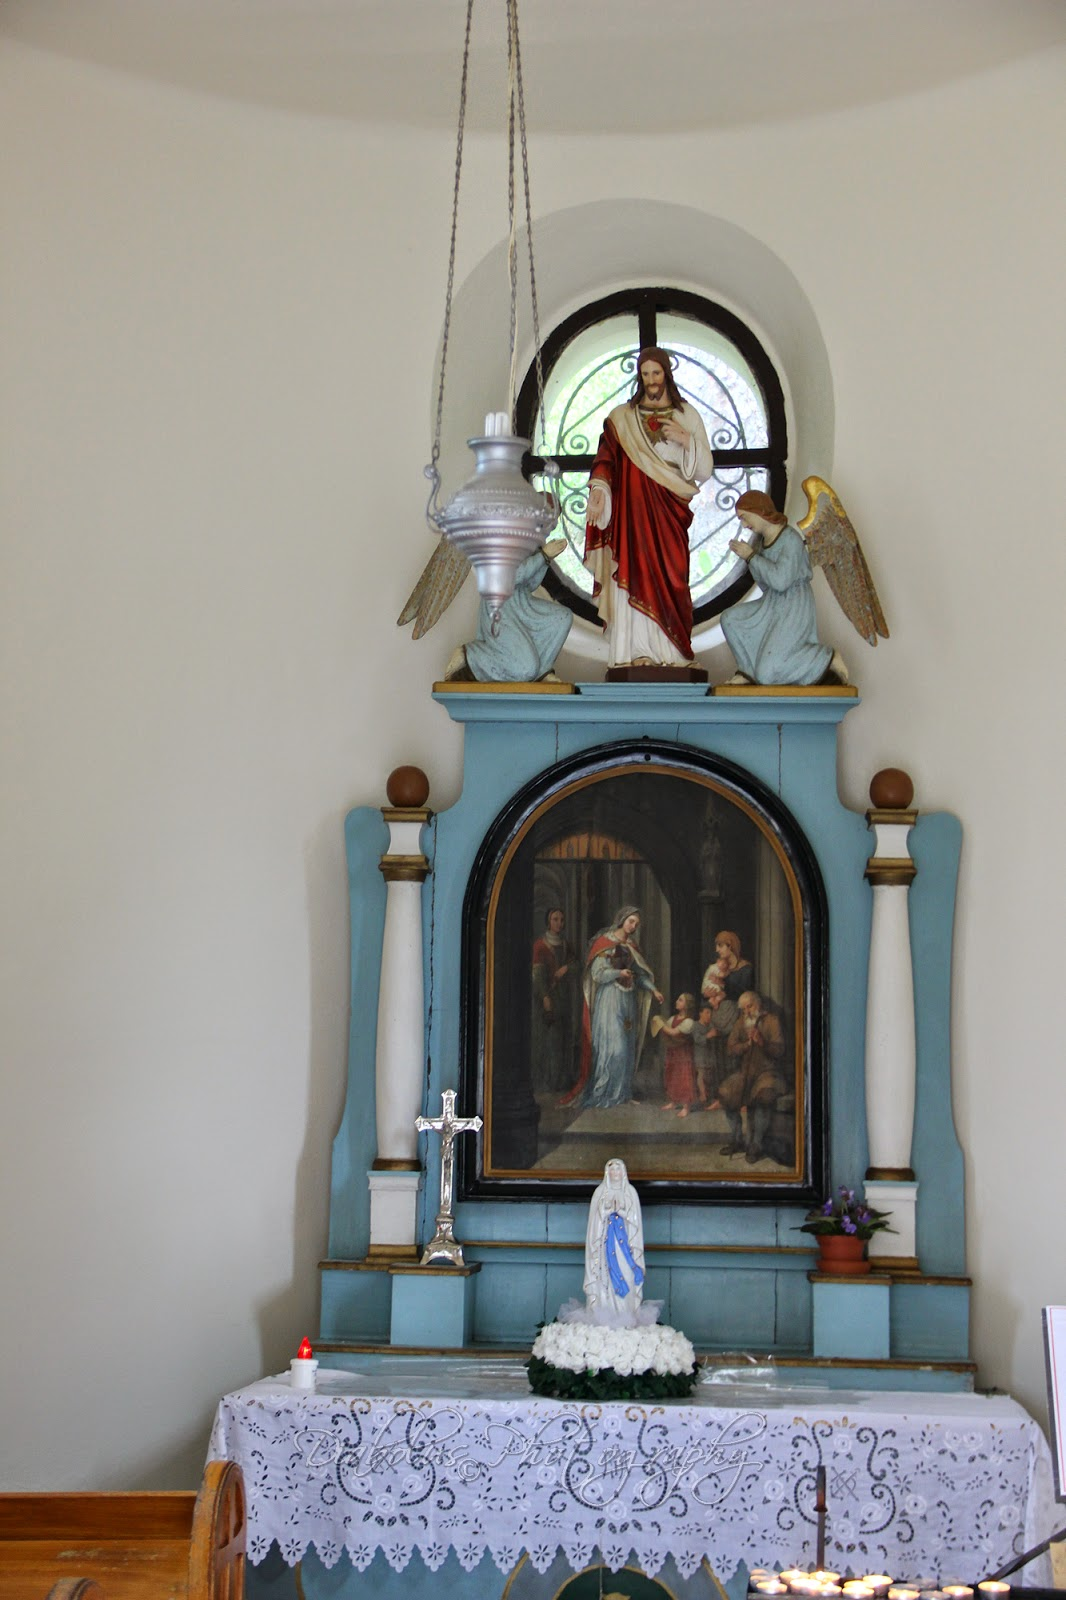 Kaple sv. Alžběty-interiér/The Chapel of St. Elizabeth-interior